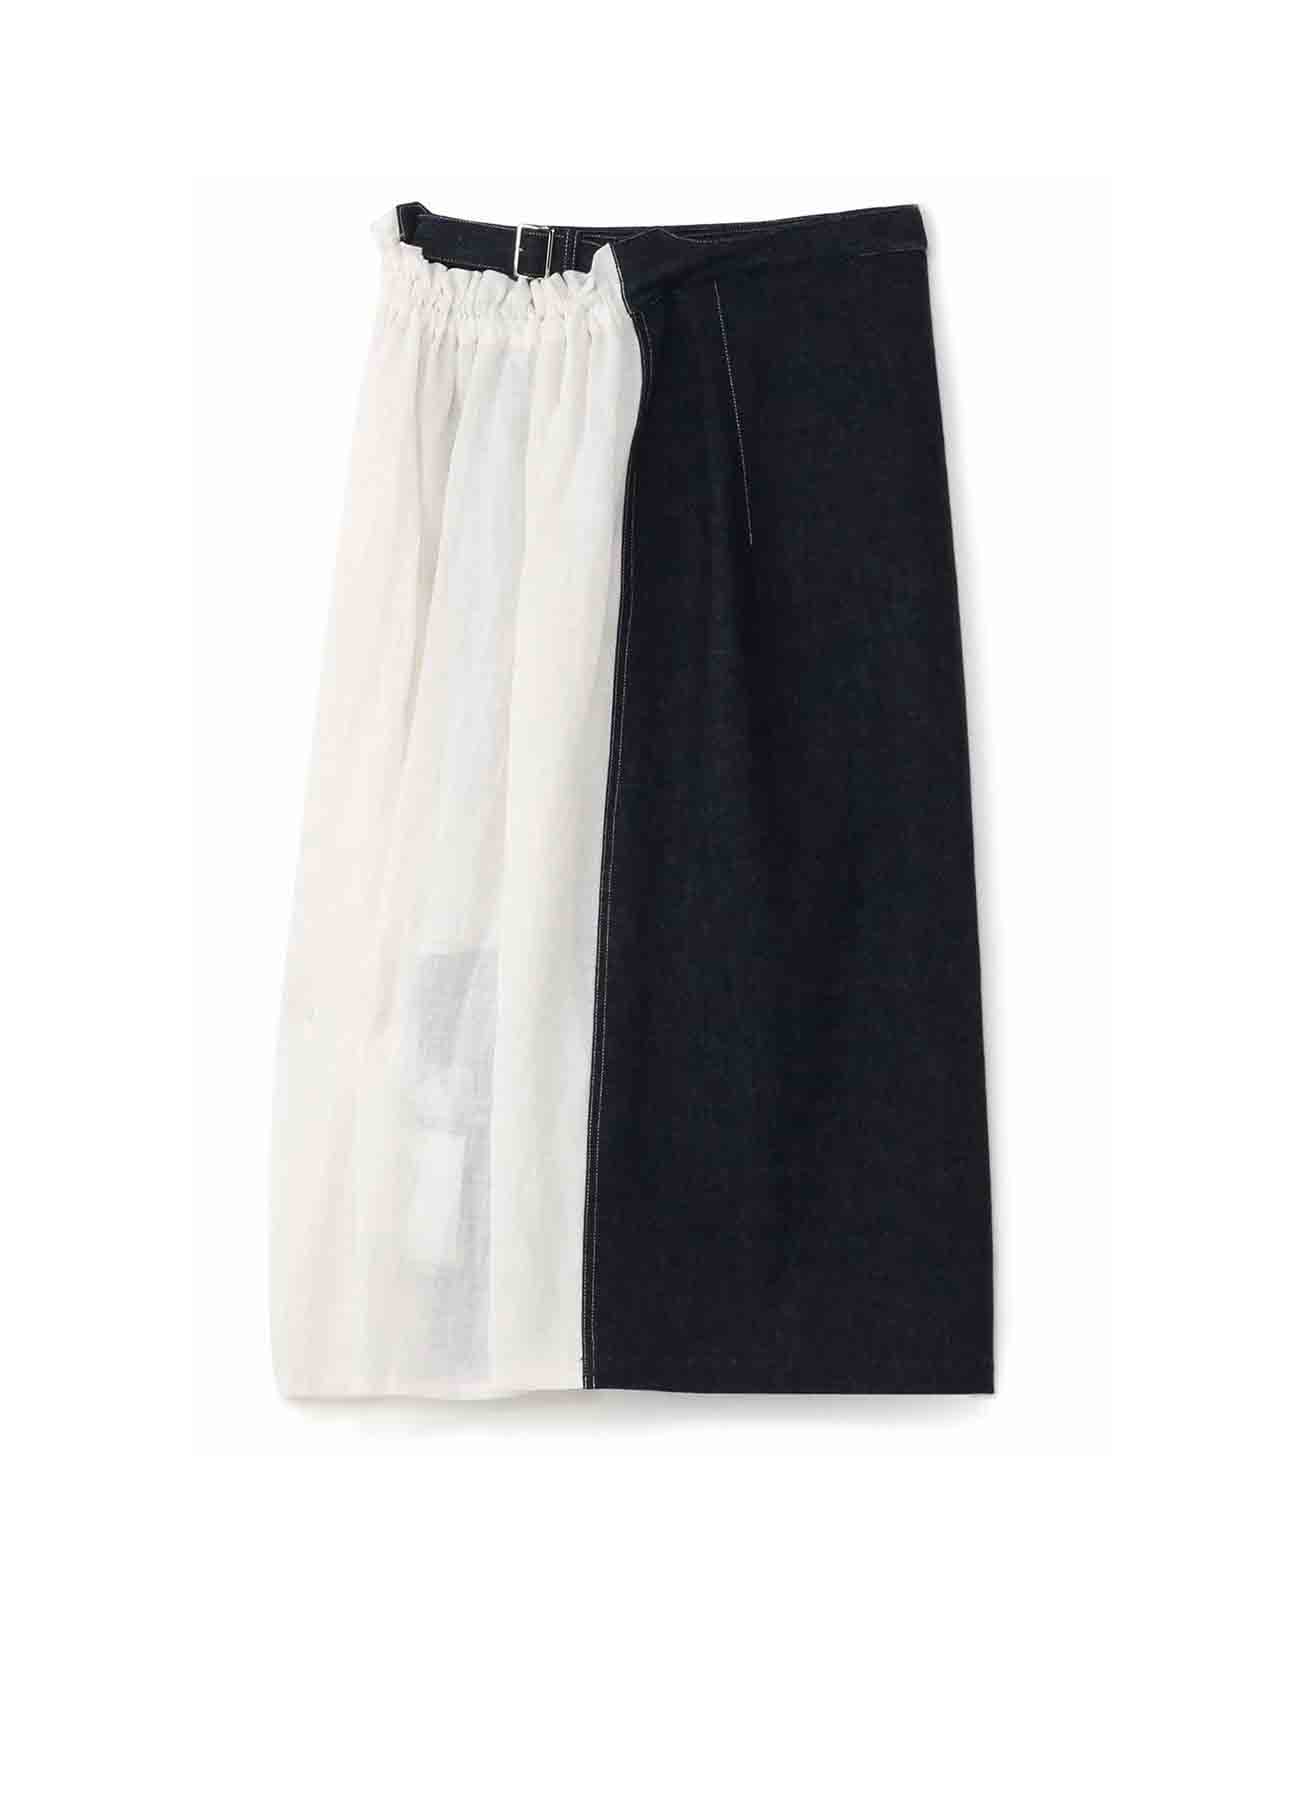 10ozデニムxコットン 二重ベルトスカート